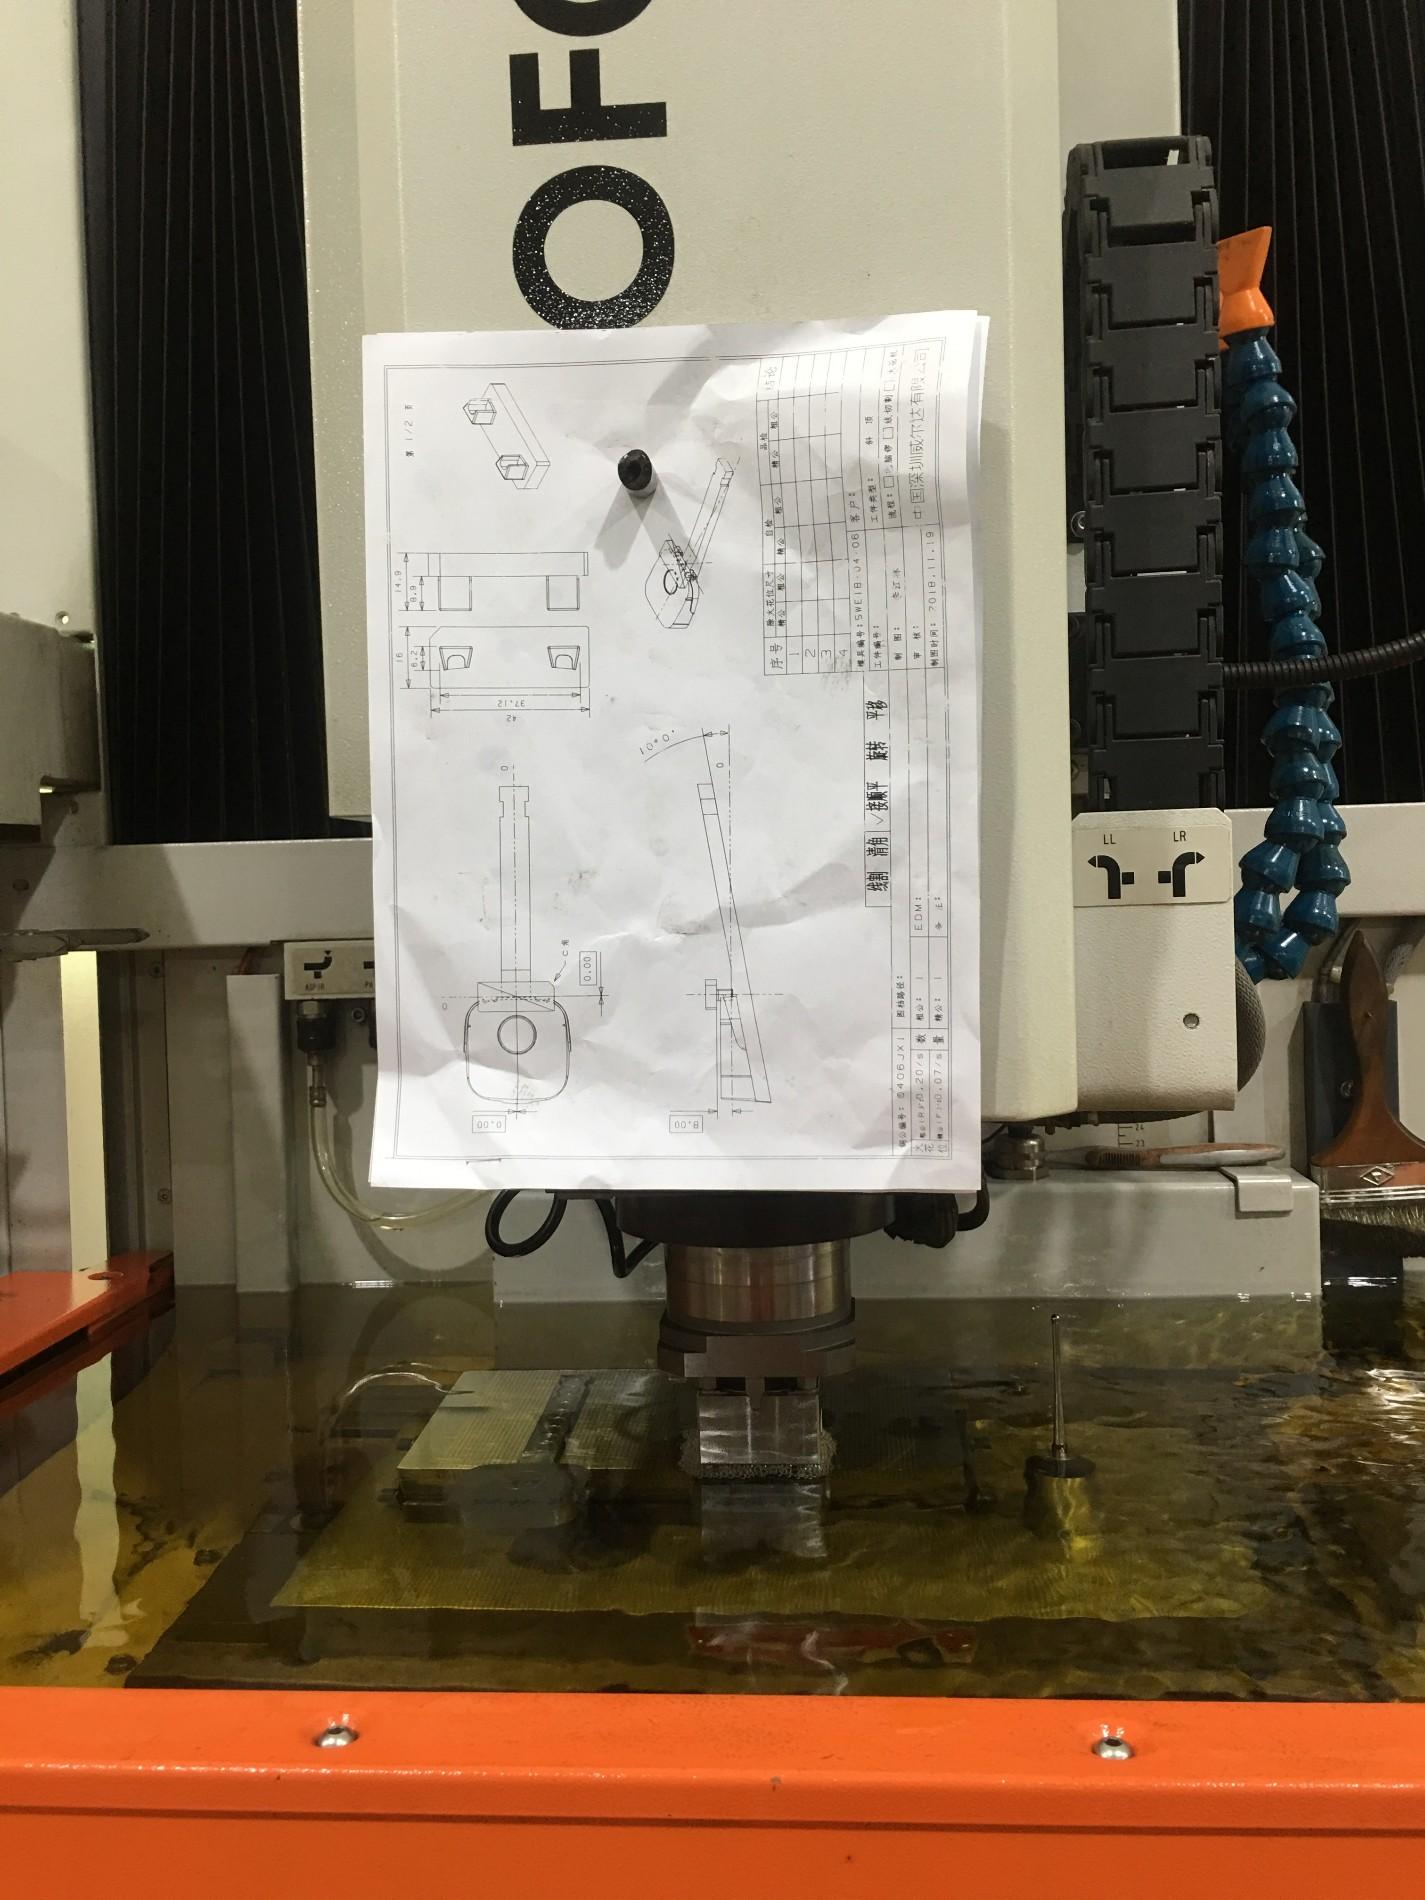 CNC Plastic Machining Parts Manufacturers, CNC Plastic Machining Parts Factory, Supply CNC Plastic Machining Parts